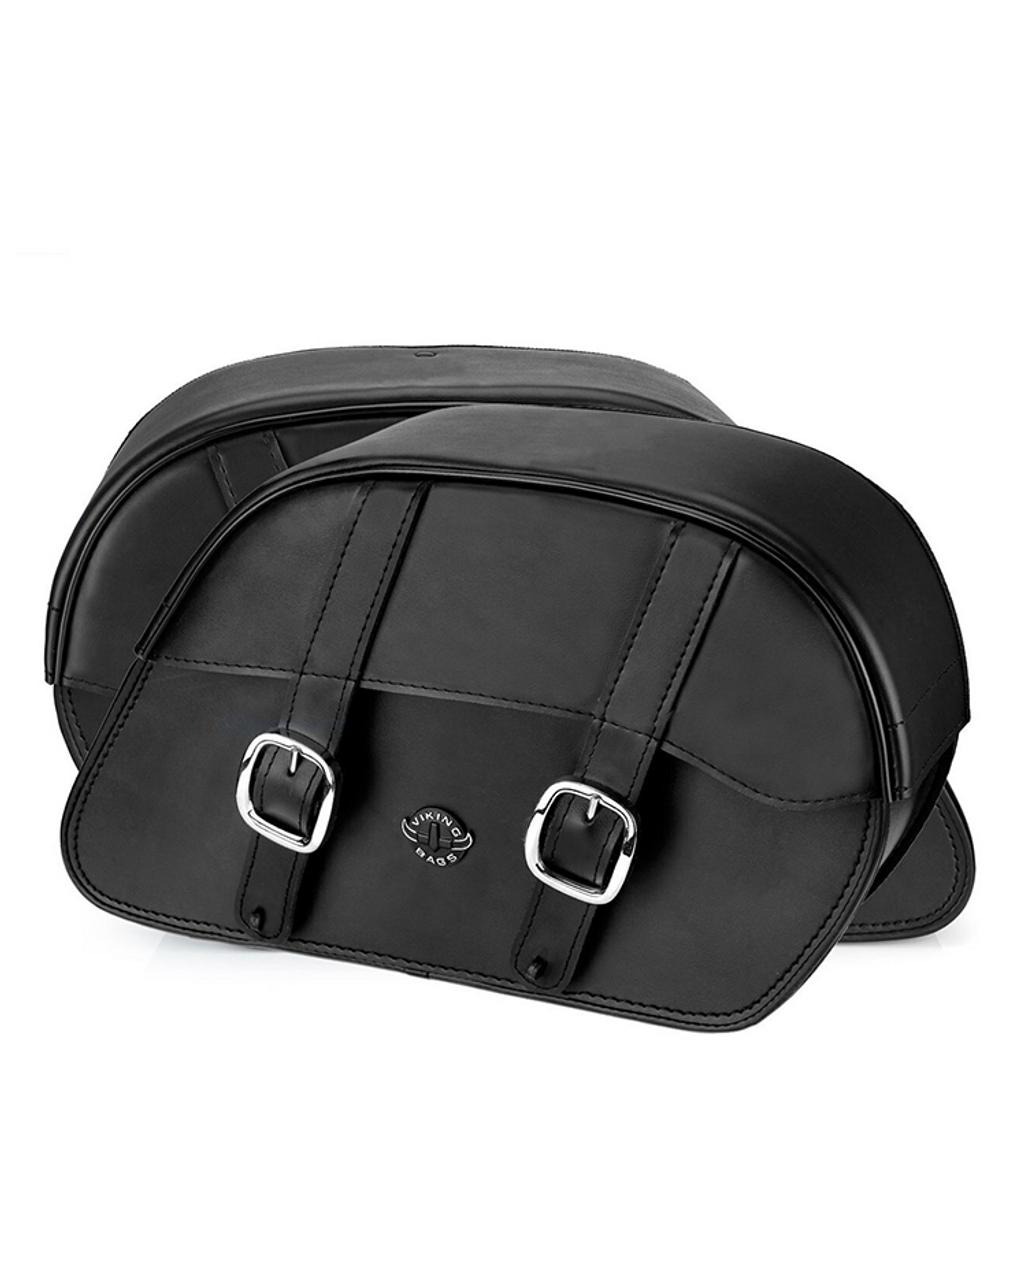 Viking Slanted Medium Motorcycle Saddlebags For Harley Softail Standard FXST Both bag view